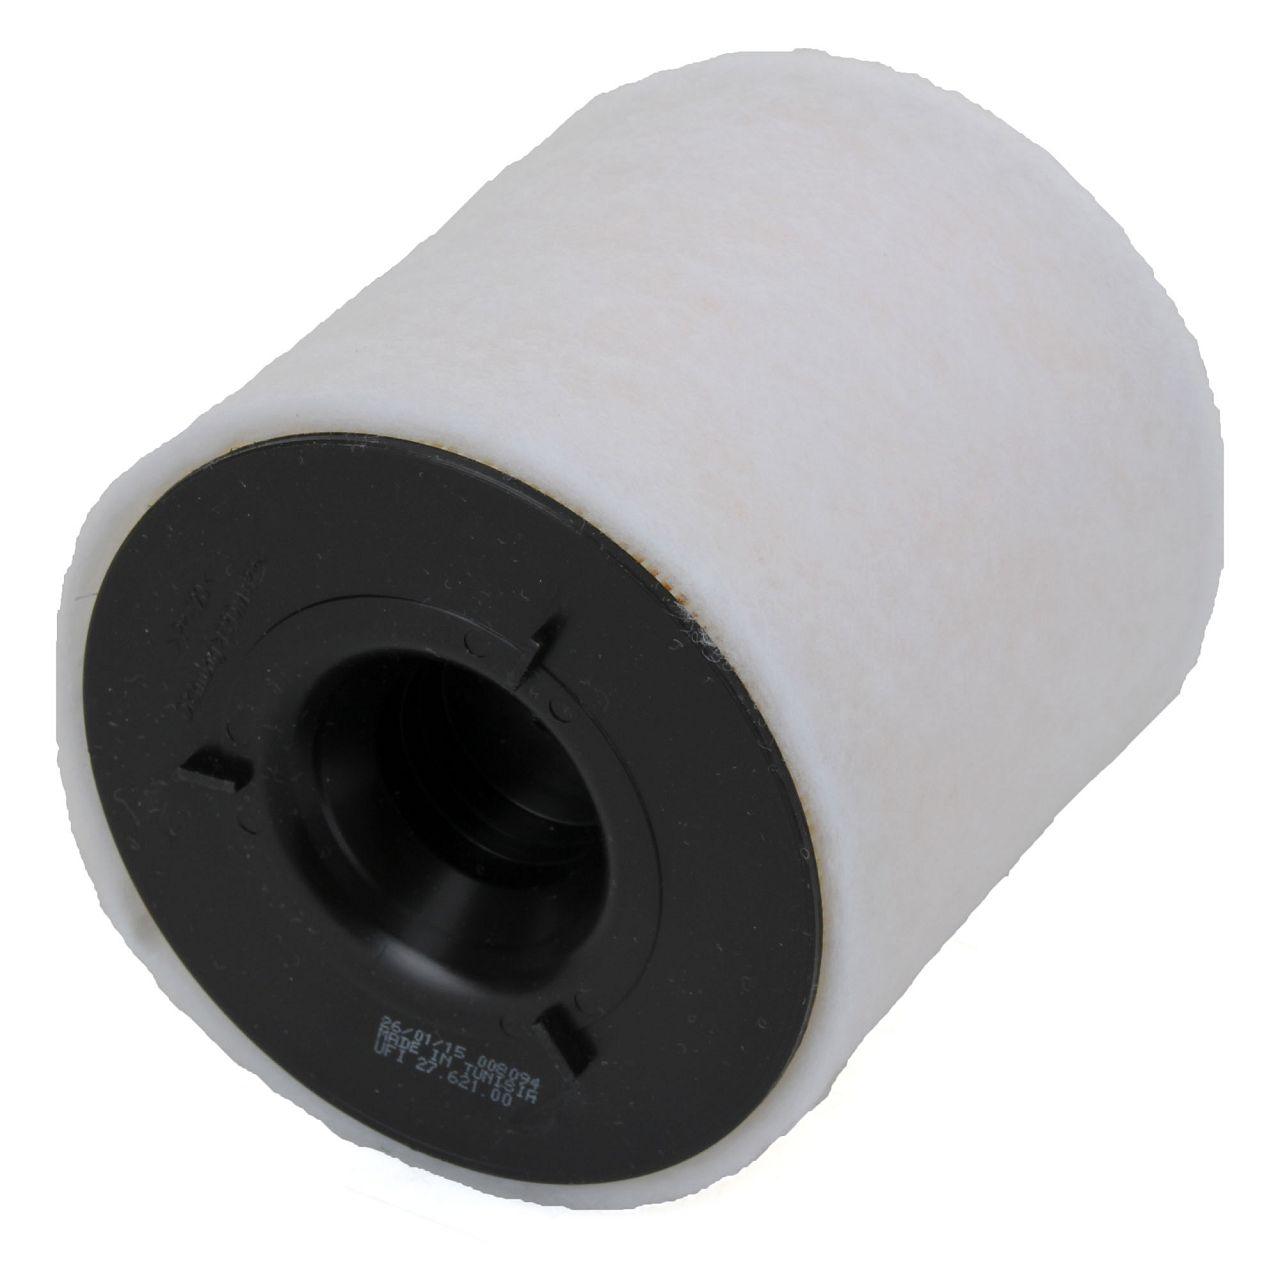 Filterpaket Filterset für SEAT IBIZA V SKODA FABIA II ROOMSTER 1.2 TDI 75 PS